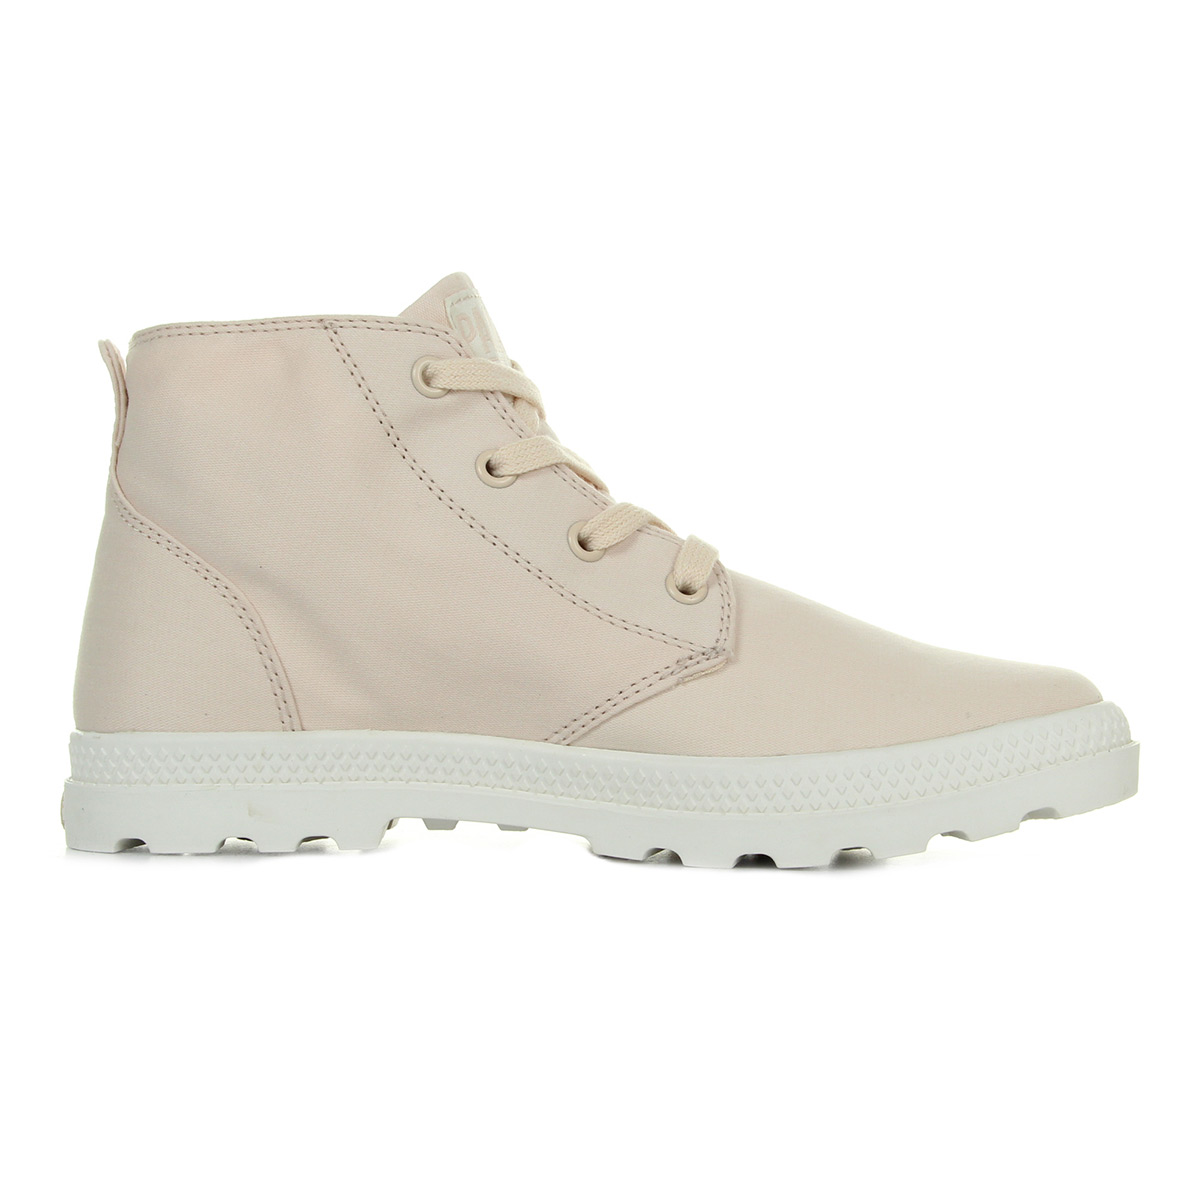 Palladium Pampa Free Cvsw Linen/Marshmallow 75182L75, Boots femme